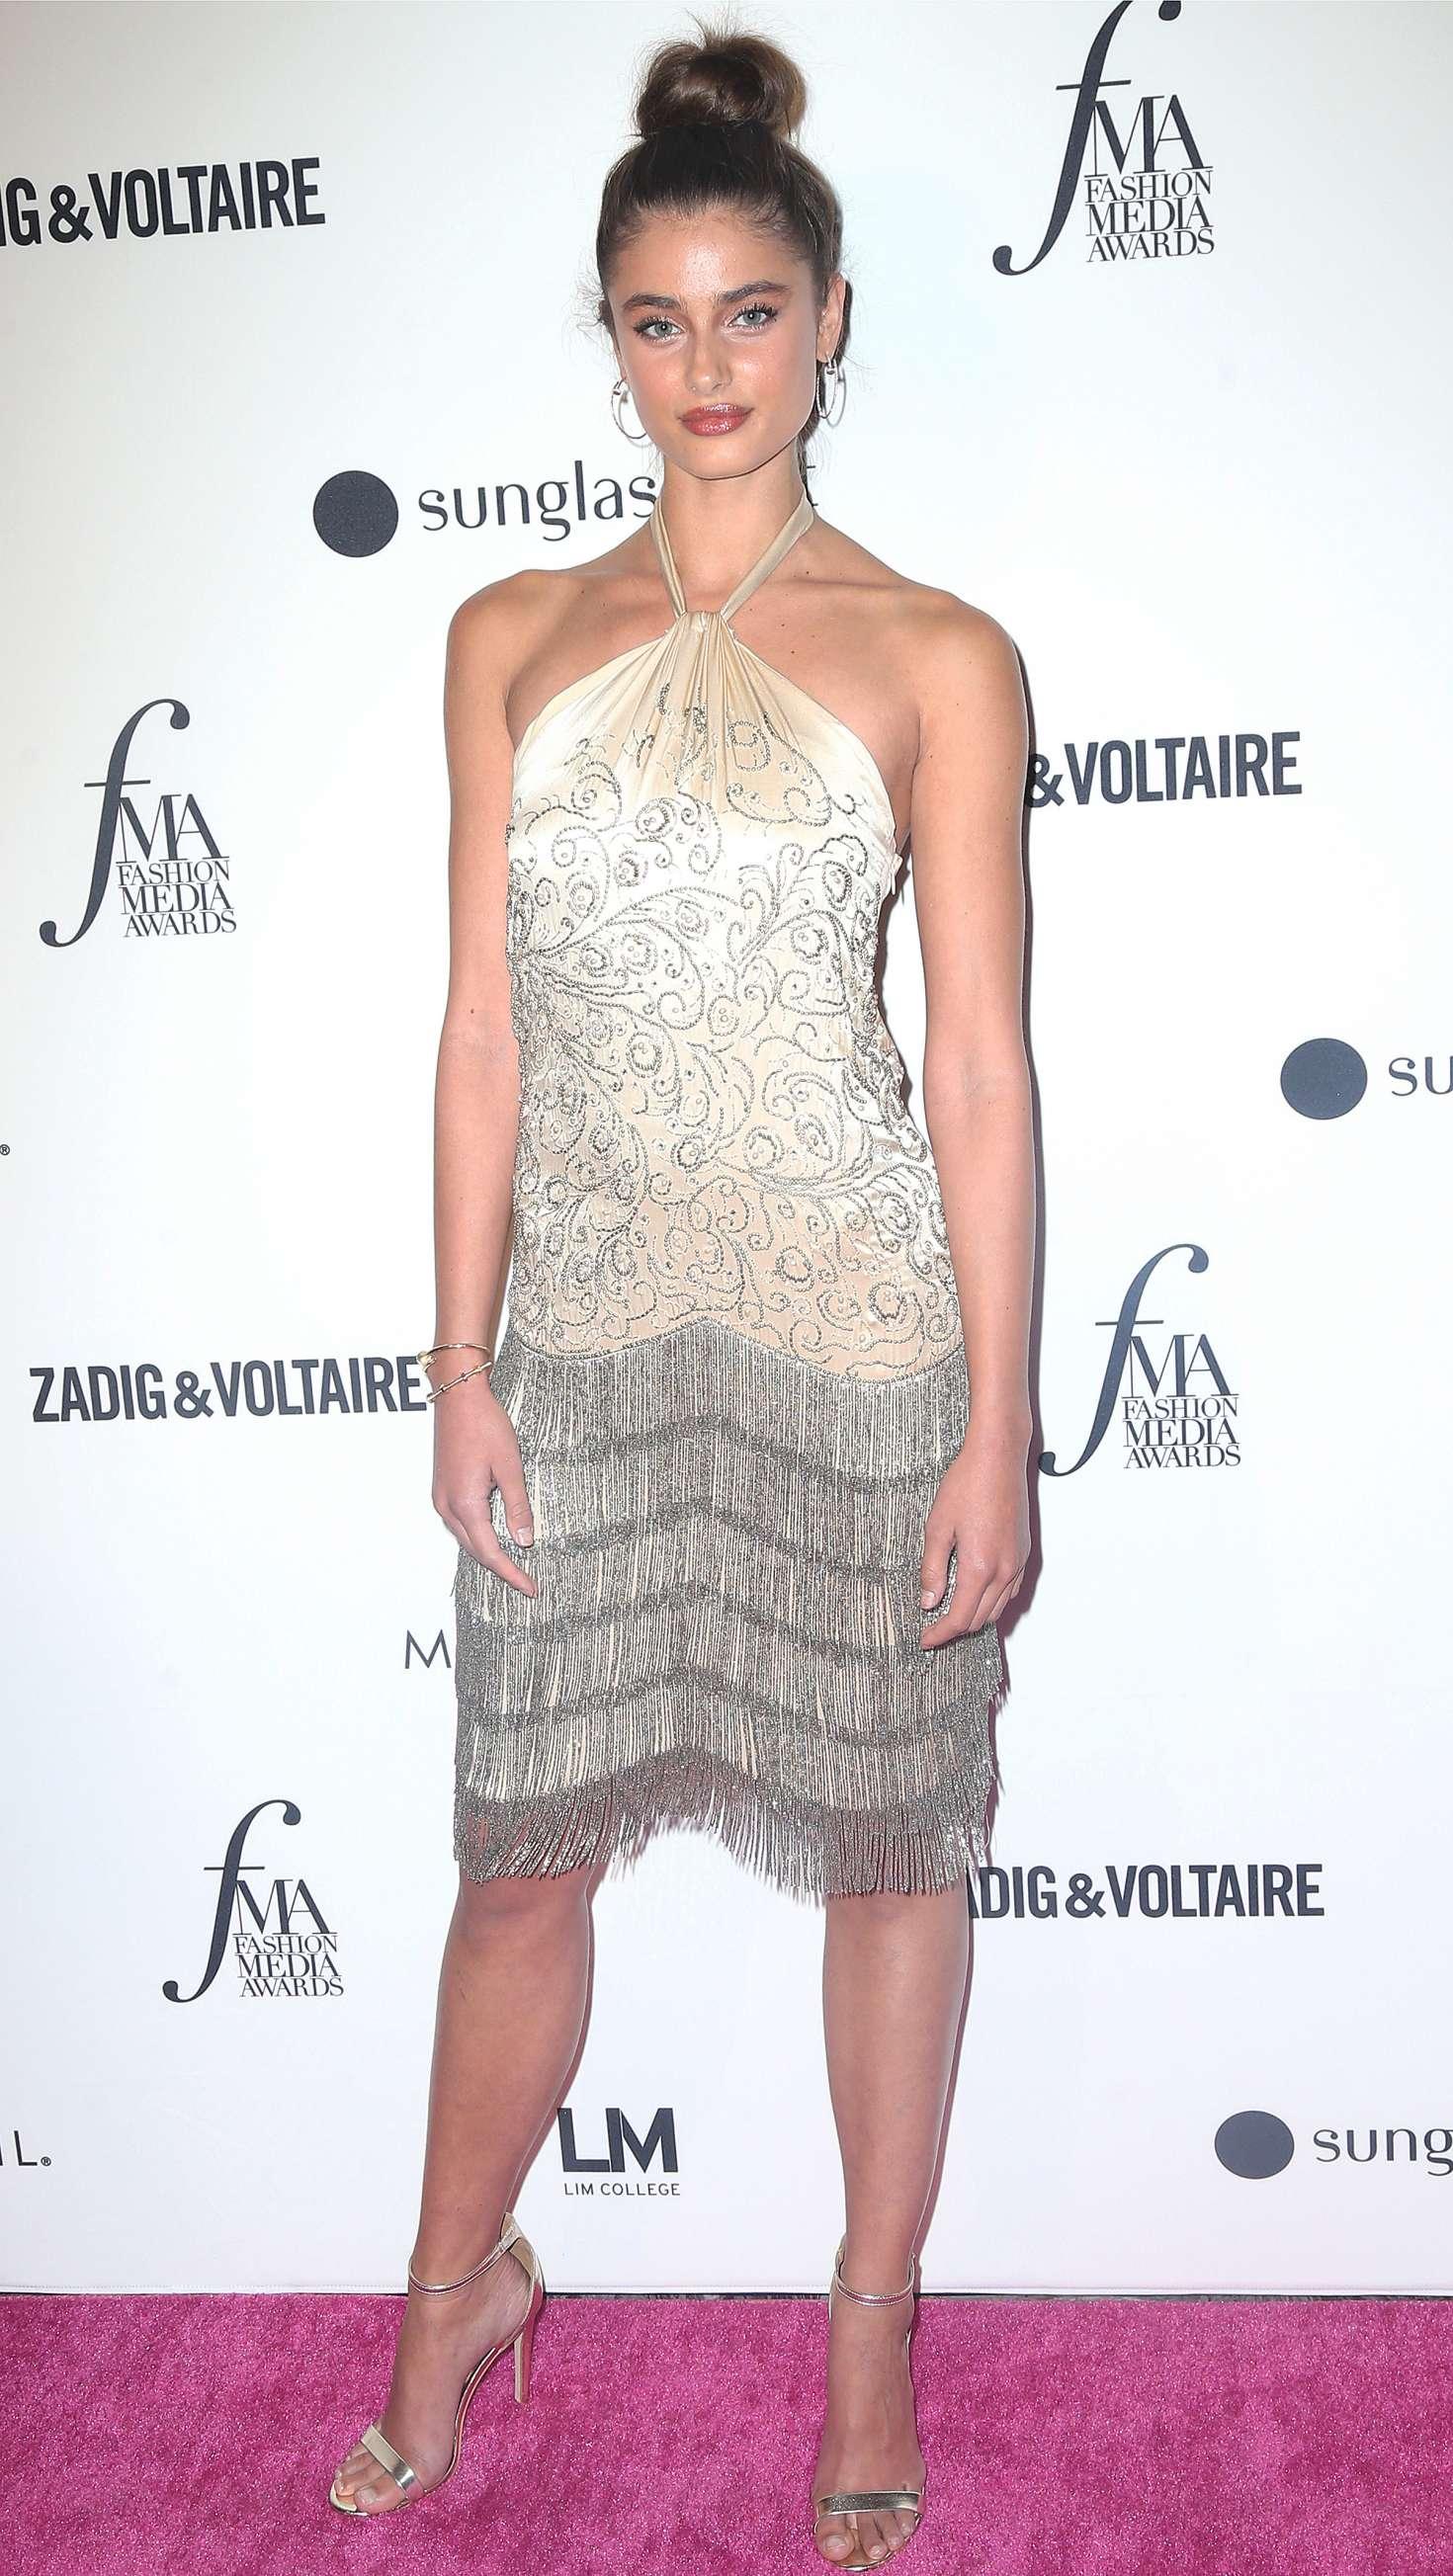 New York Fashion Awards